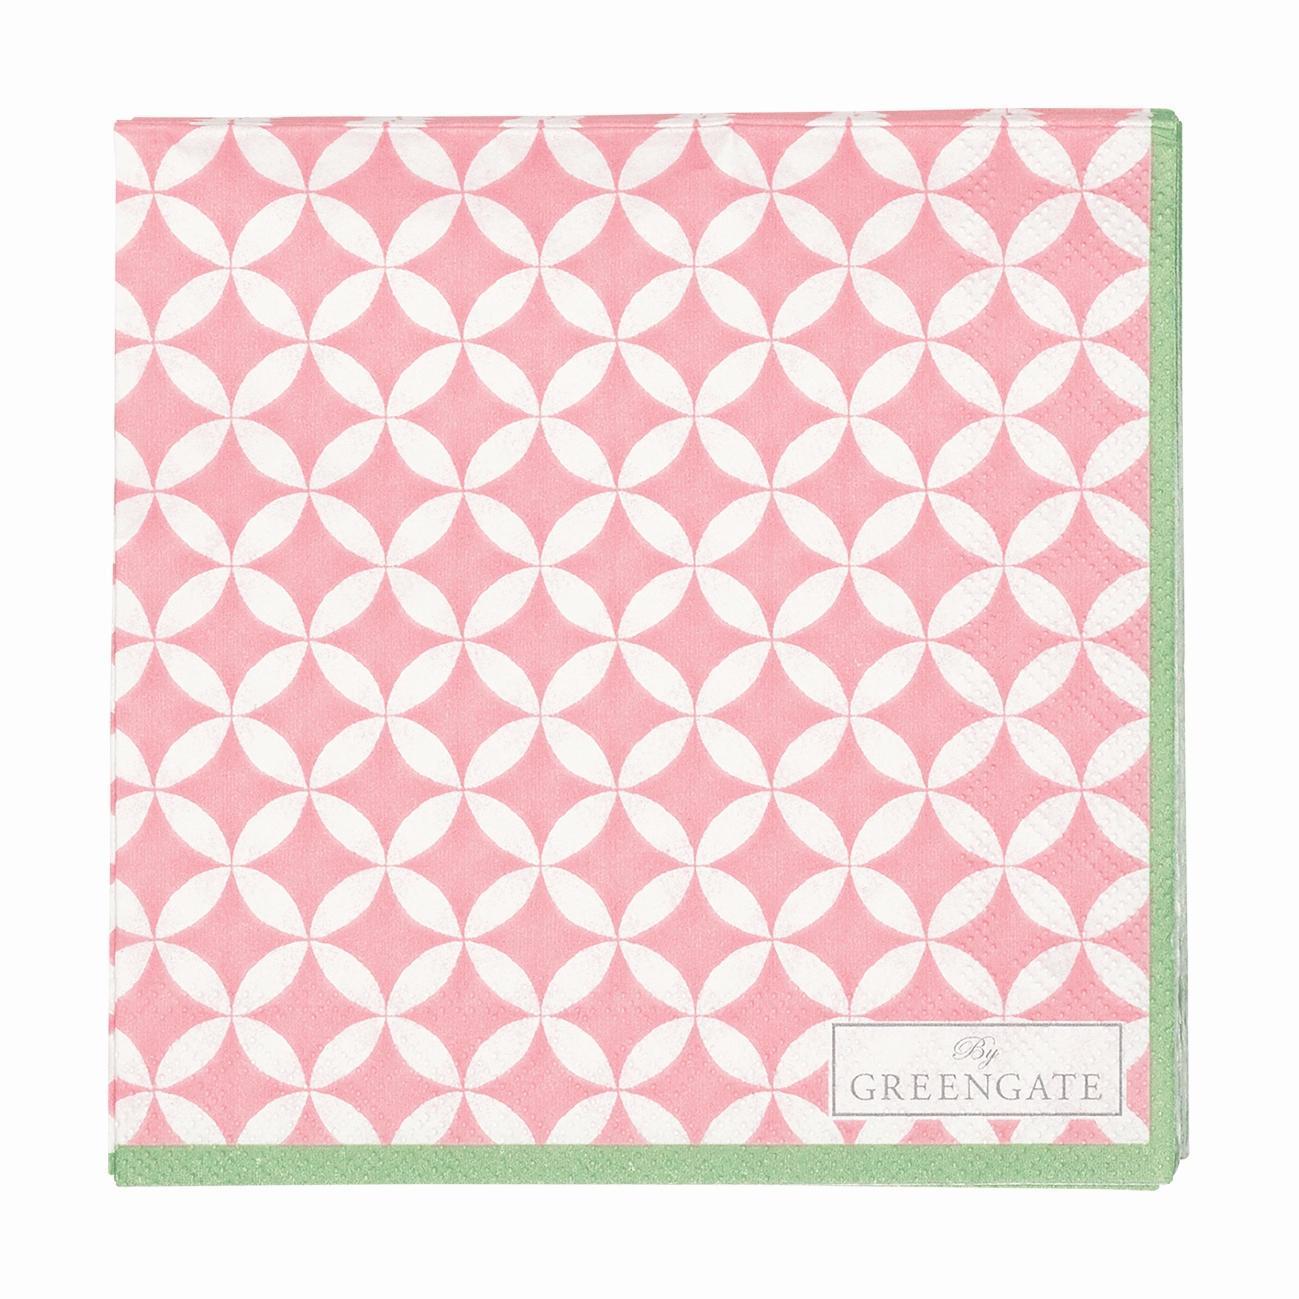 GREEN GATE Papírové ubrousky Mai peach - malé, růžová barva, papír